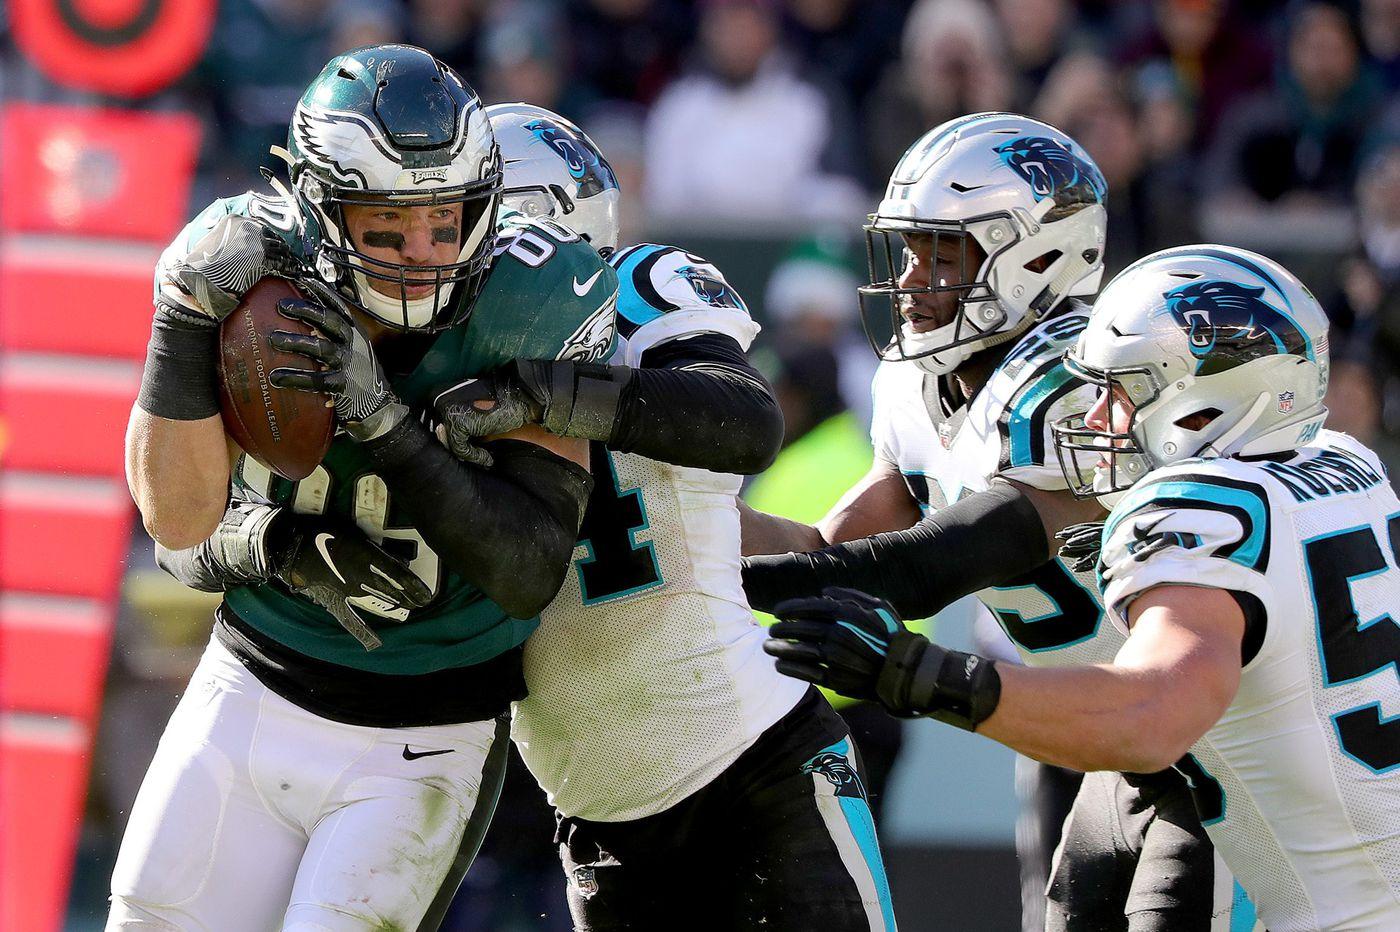 Eagles-Panthers: Eric Reid's 'interception,' Zach Ertz makes his mark, Joel Embiid meets Brian Dawkins and more | Social media roundup